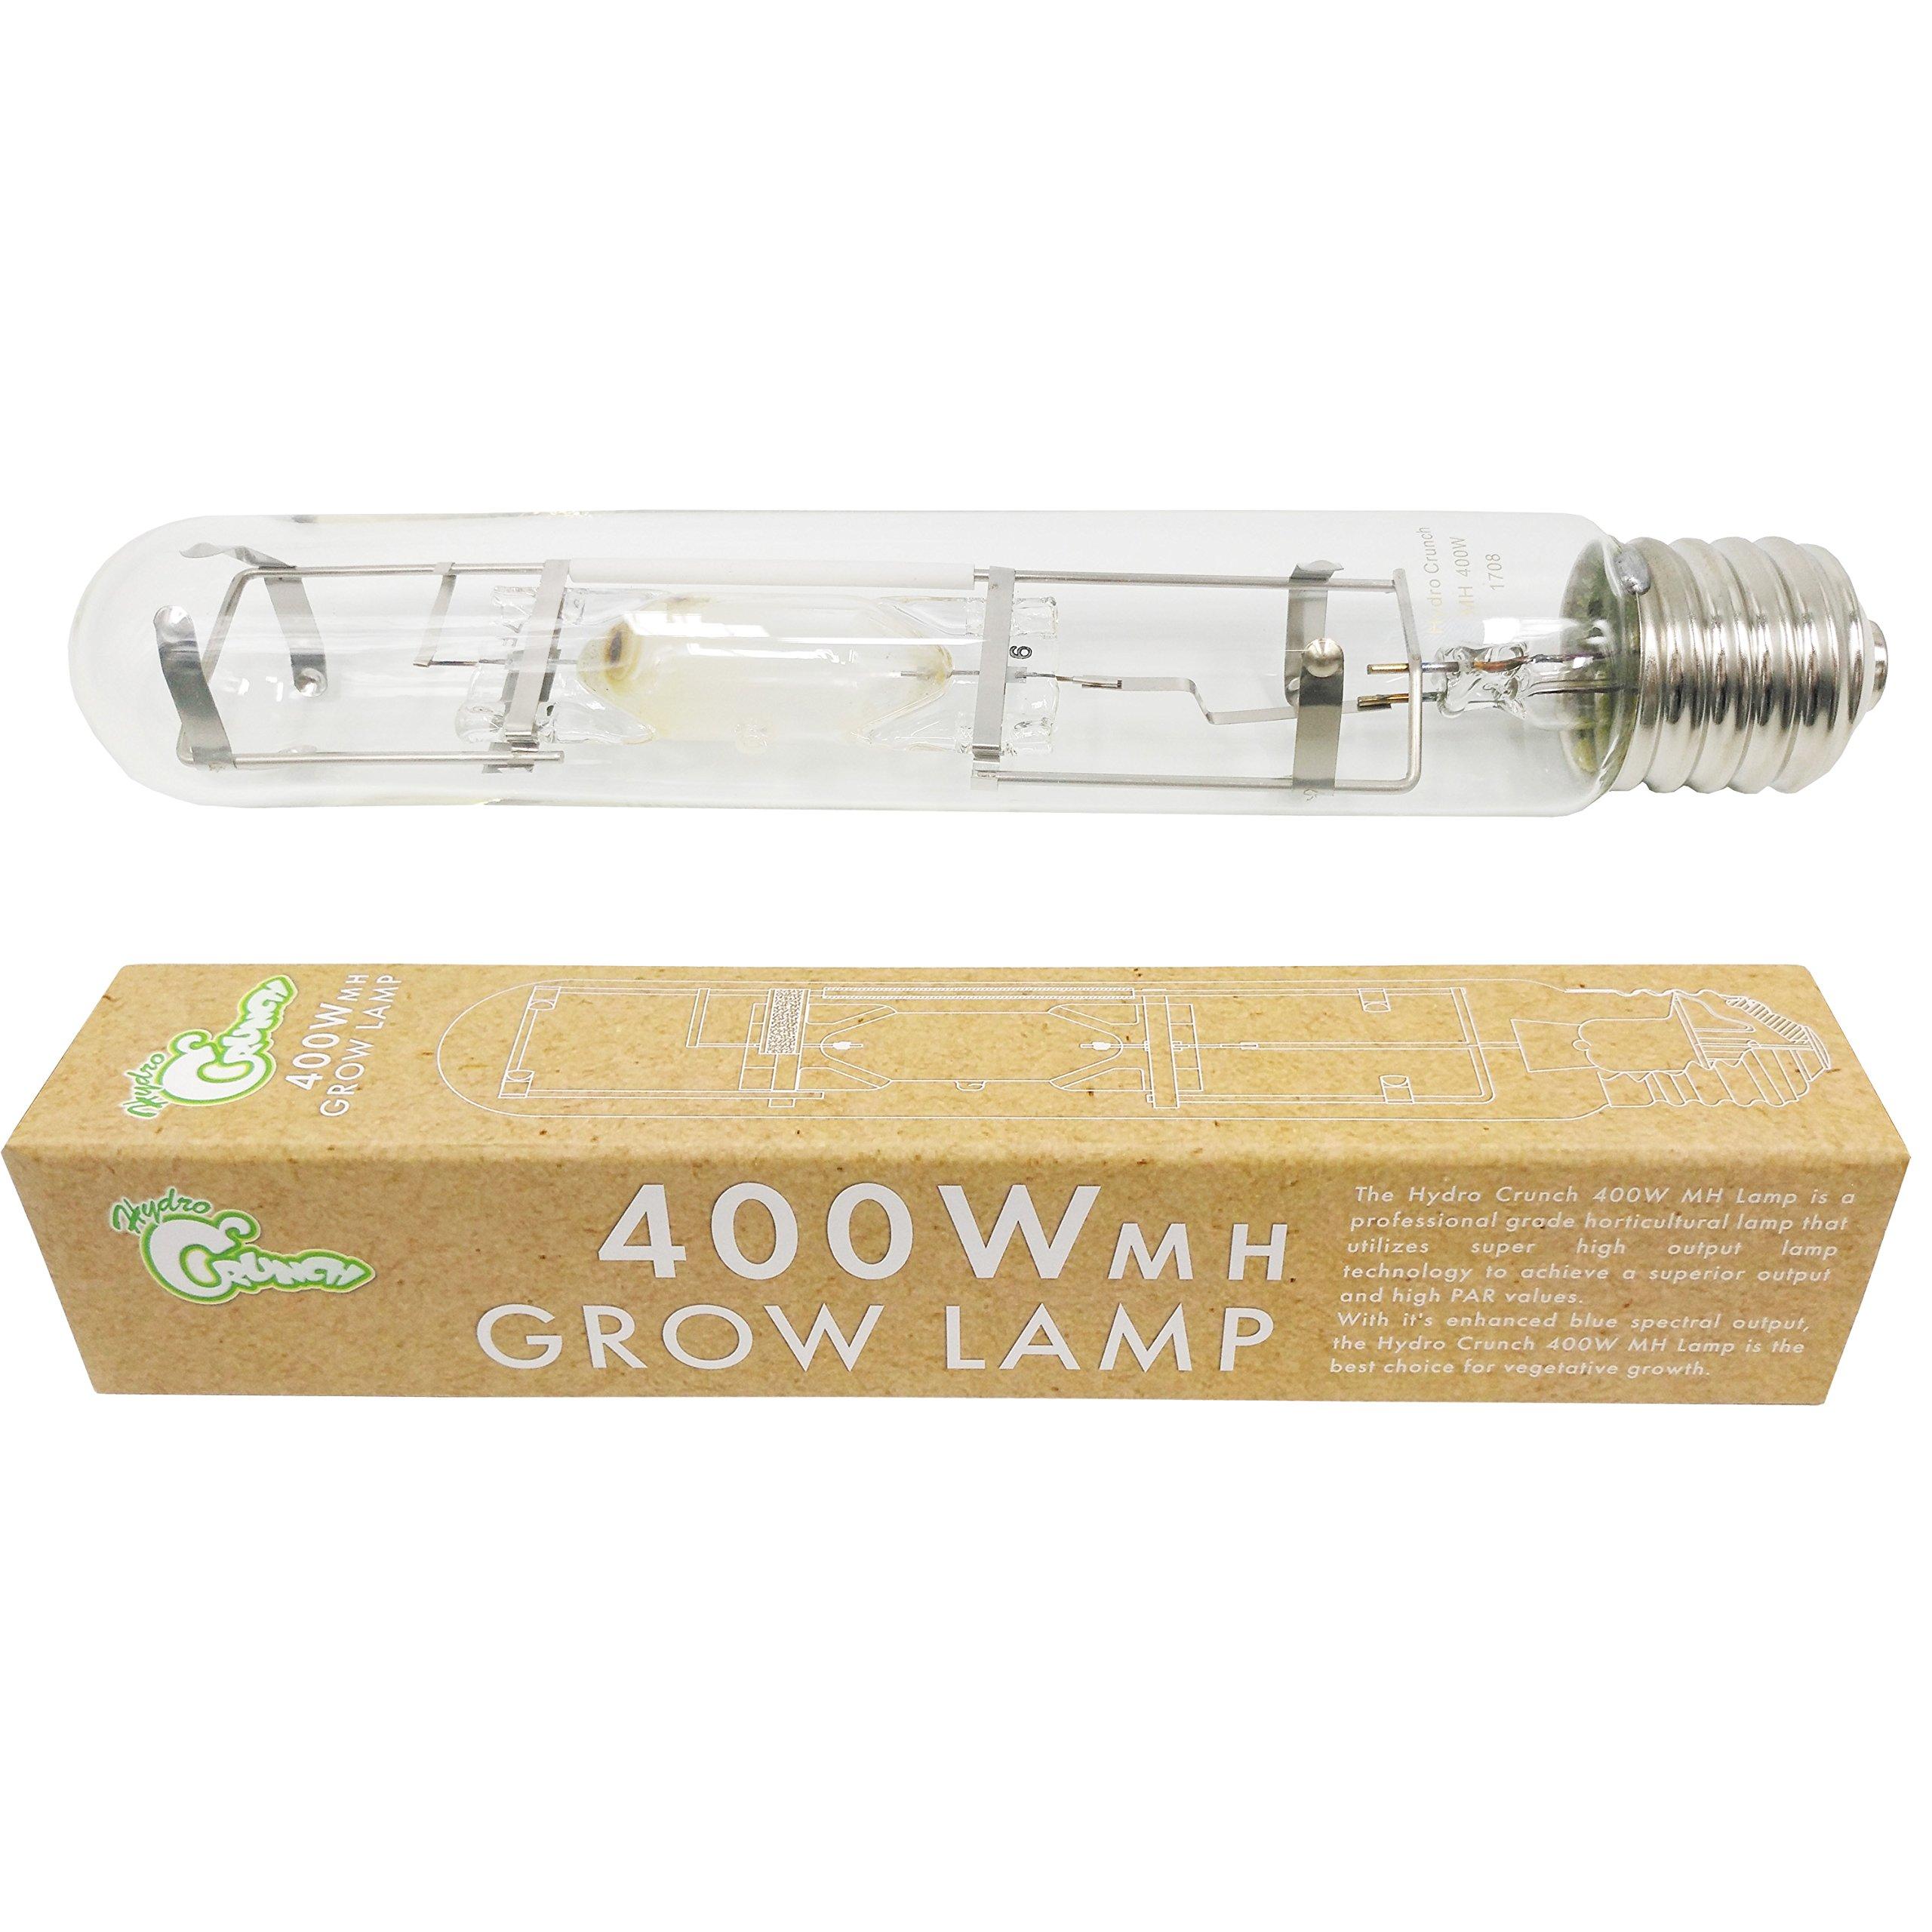 Hydro Crunch 400-Watt Metal Halide MH Grow Light Bulb Lamp